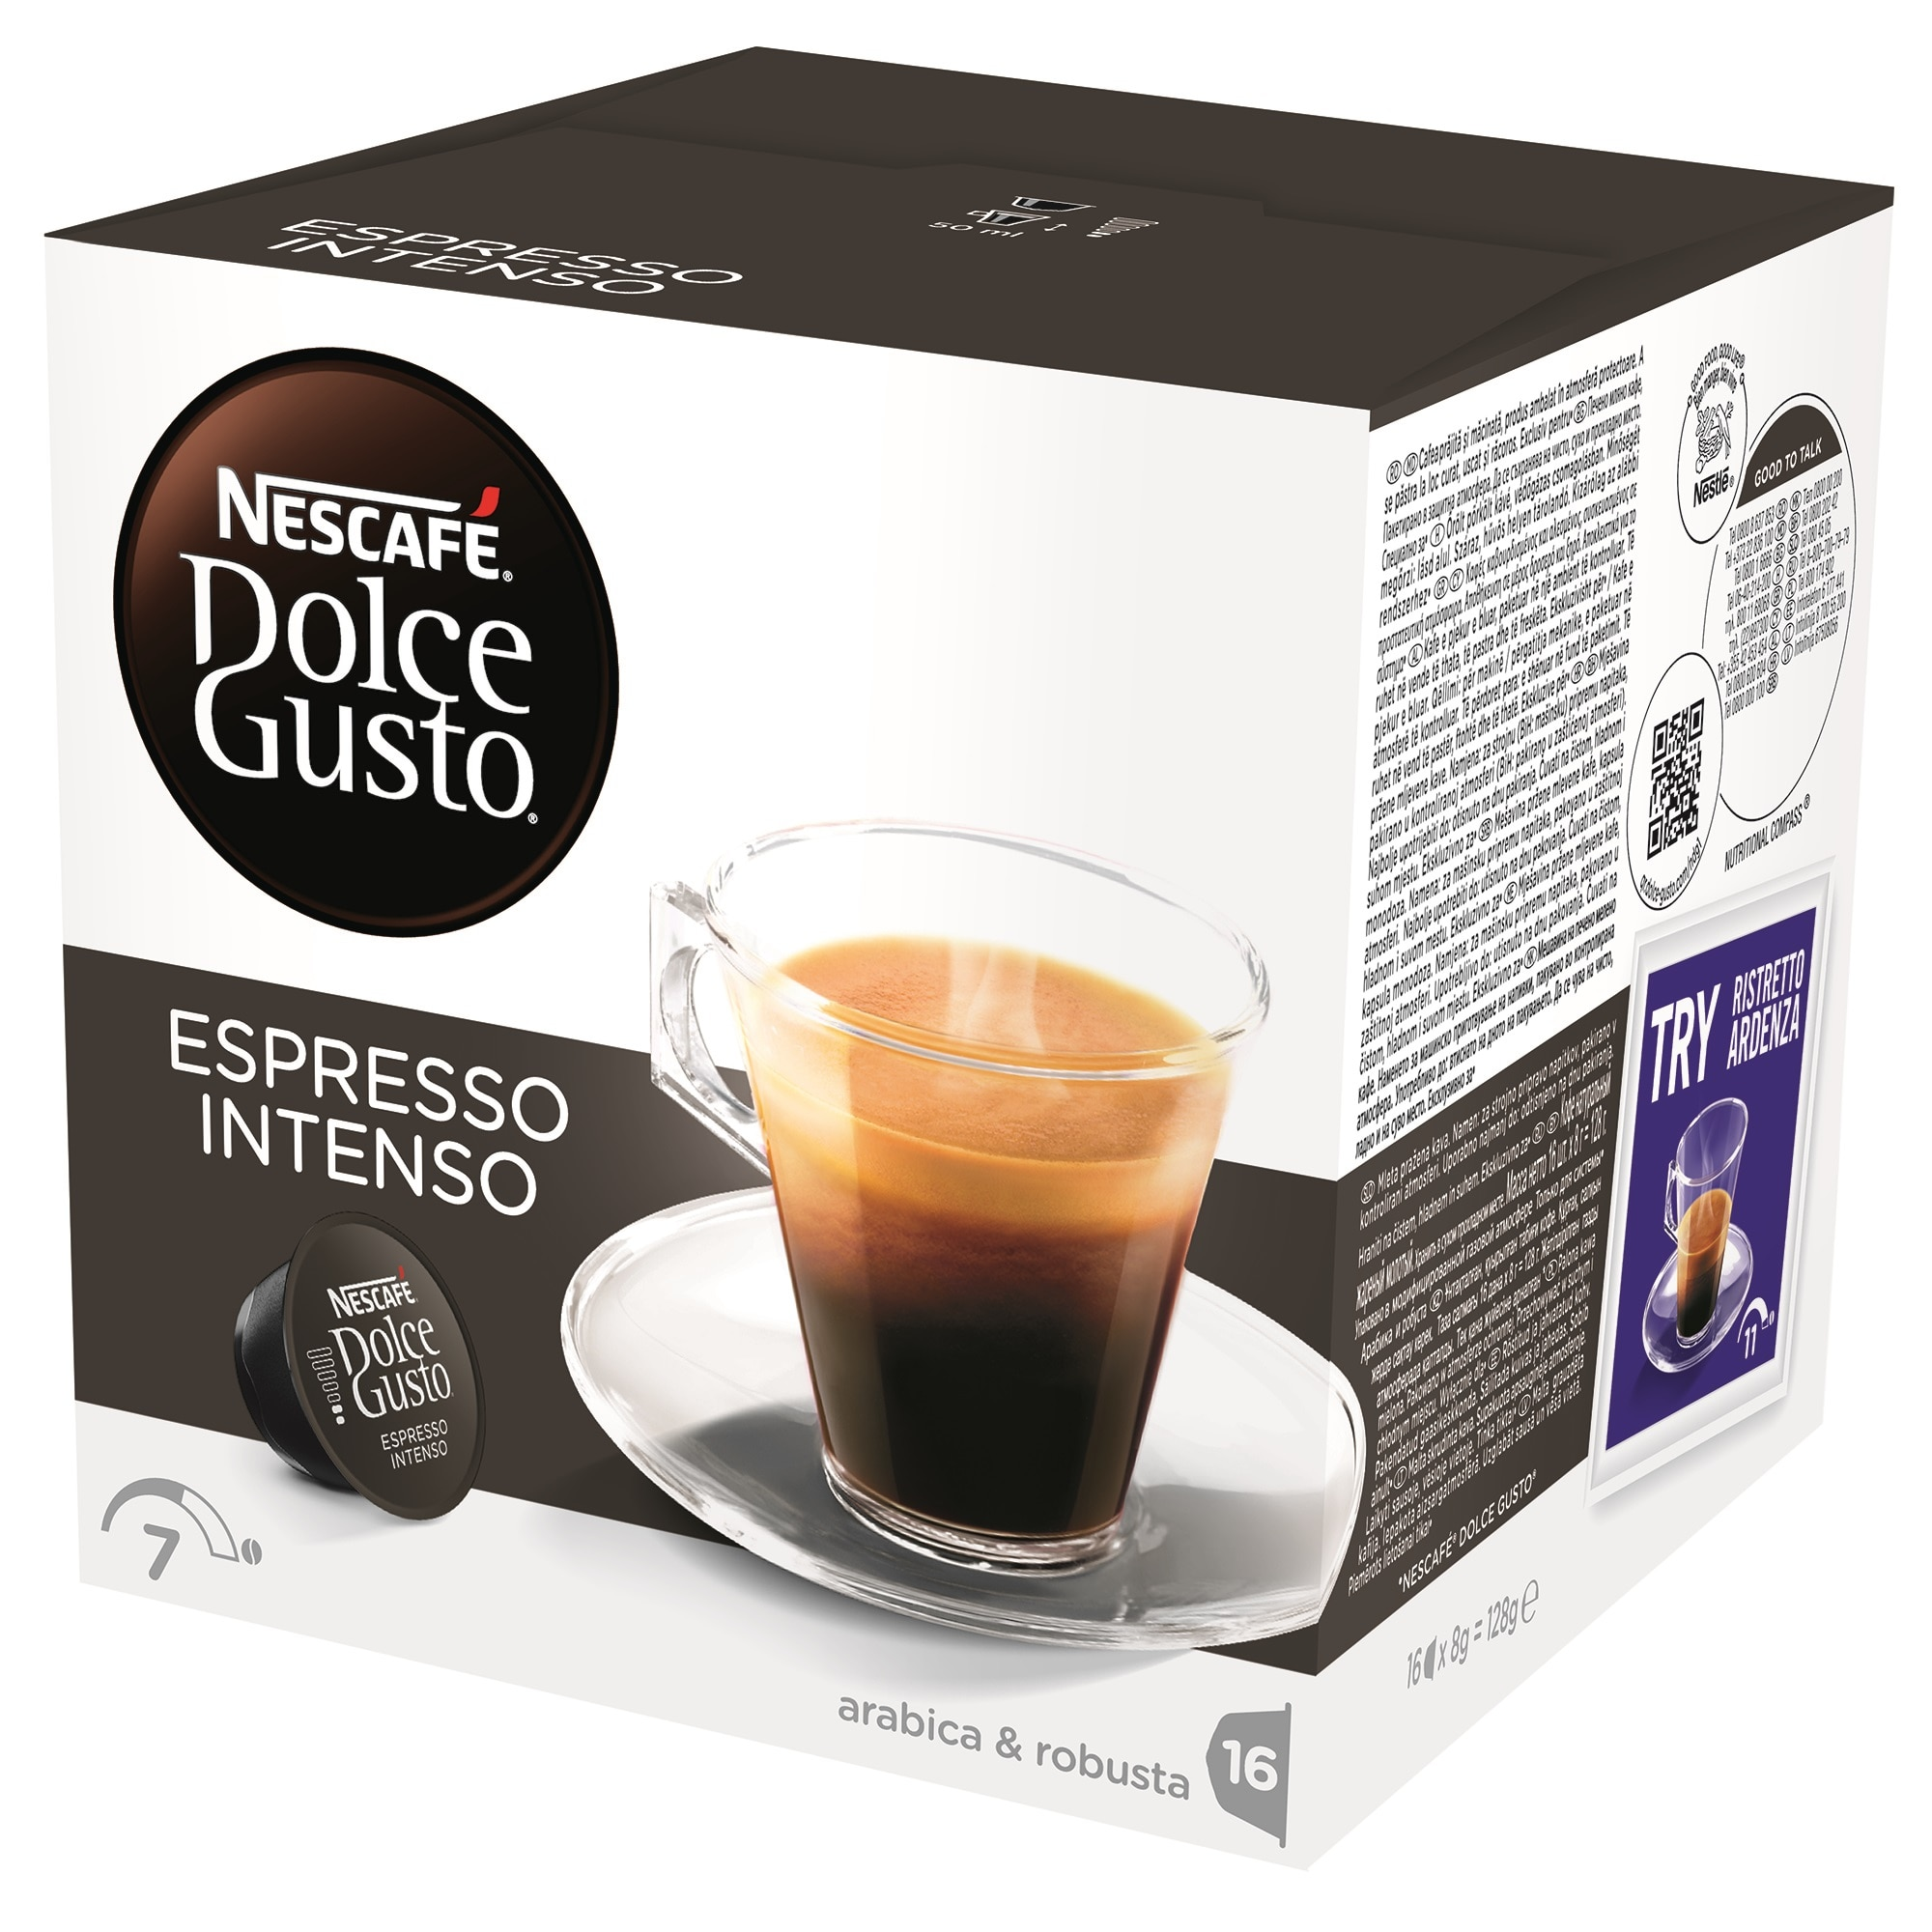 NESCAFÉ Dolce Gusto Espresso Barista 16 db kapszula